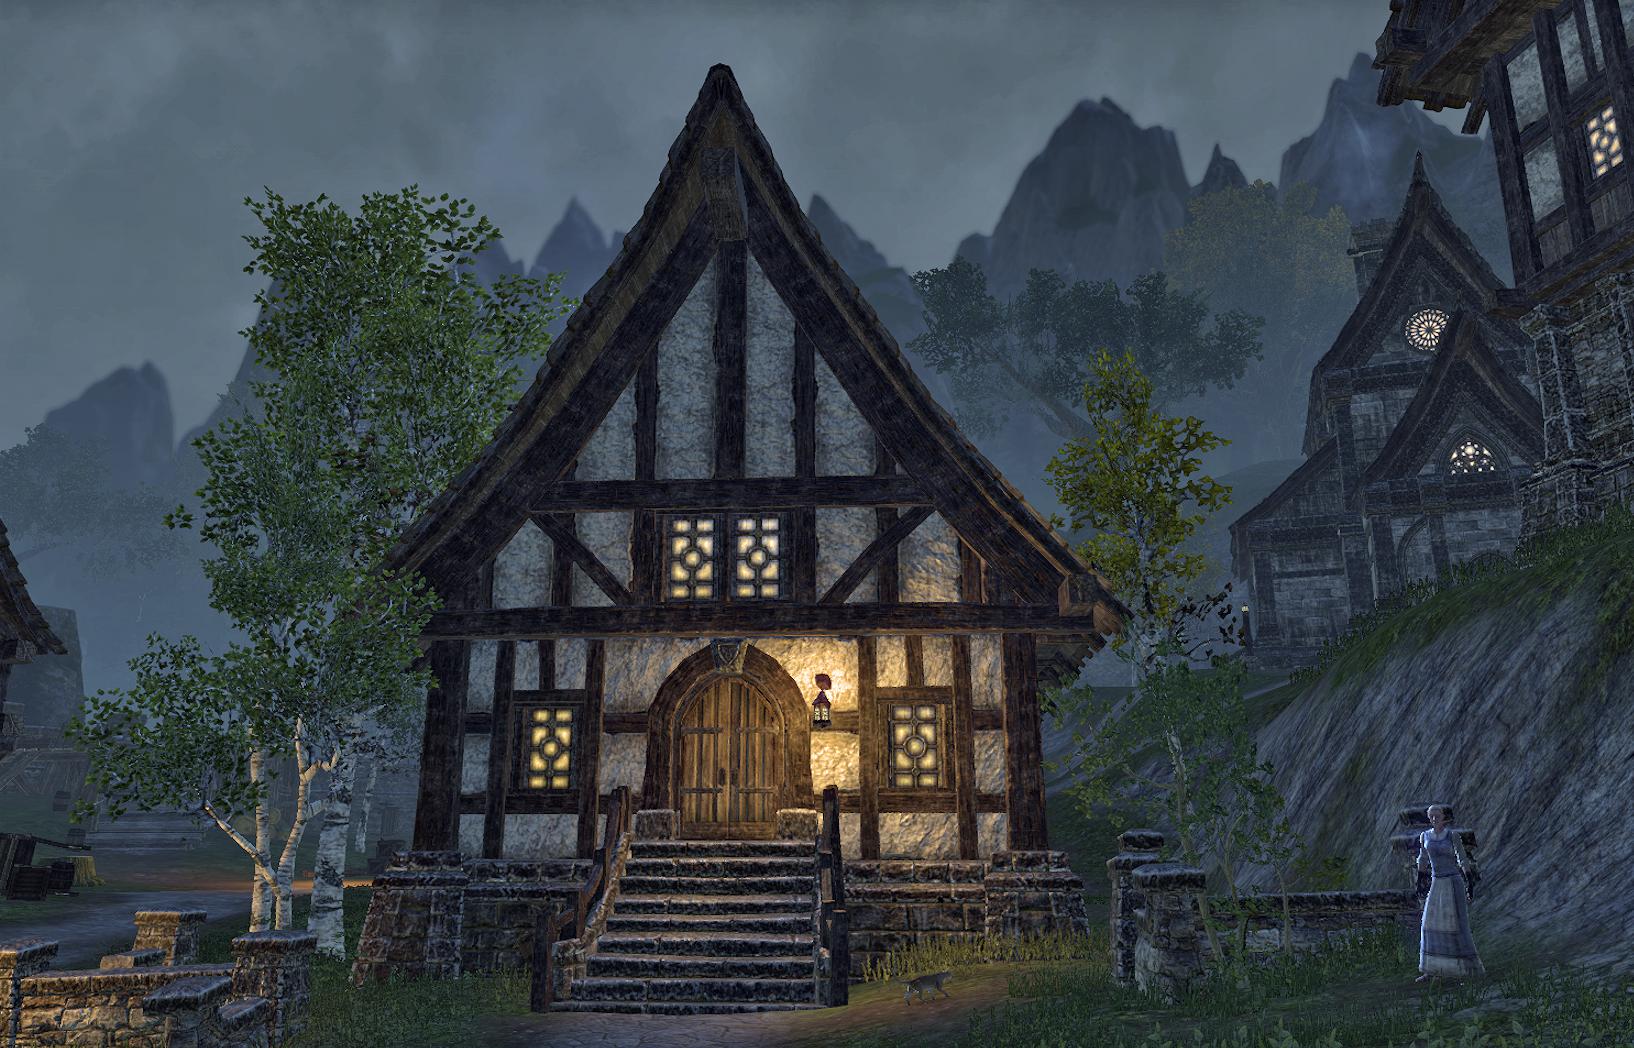 Theodore's House